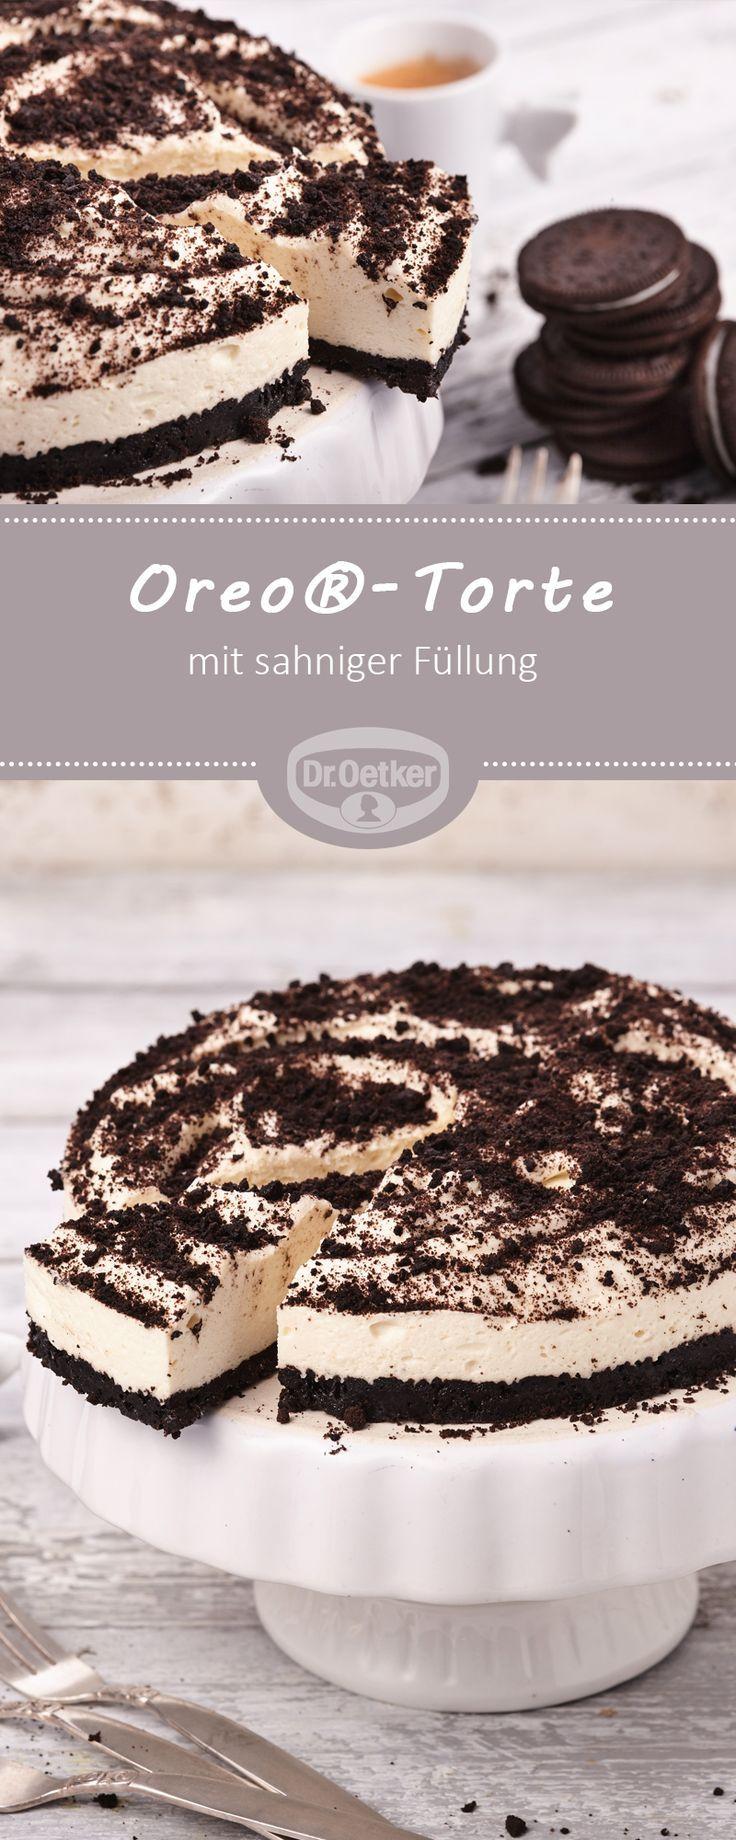 Oreo®-Torte